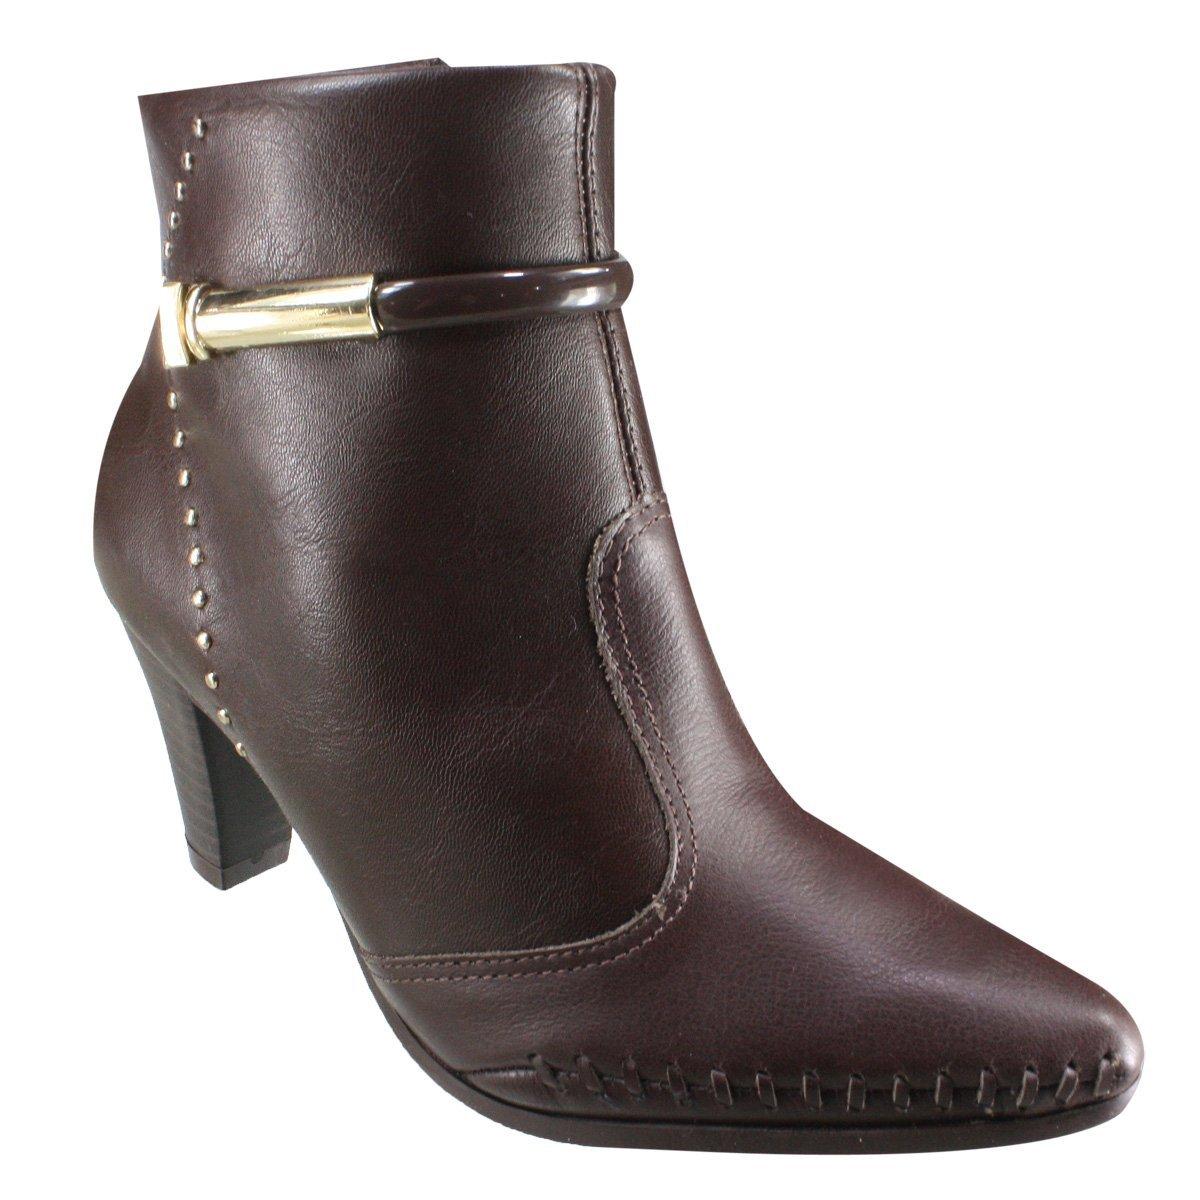 8a535c828 Bota Ramarim Ankle Boot 18-15101 000002 - Brown (Naturale Soft ...